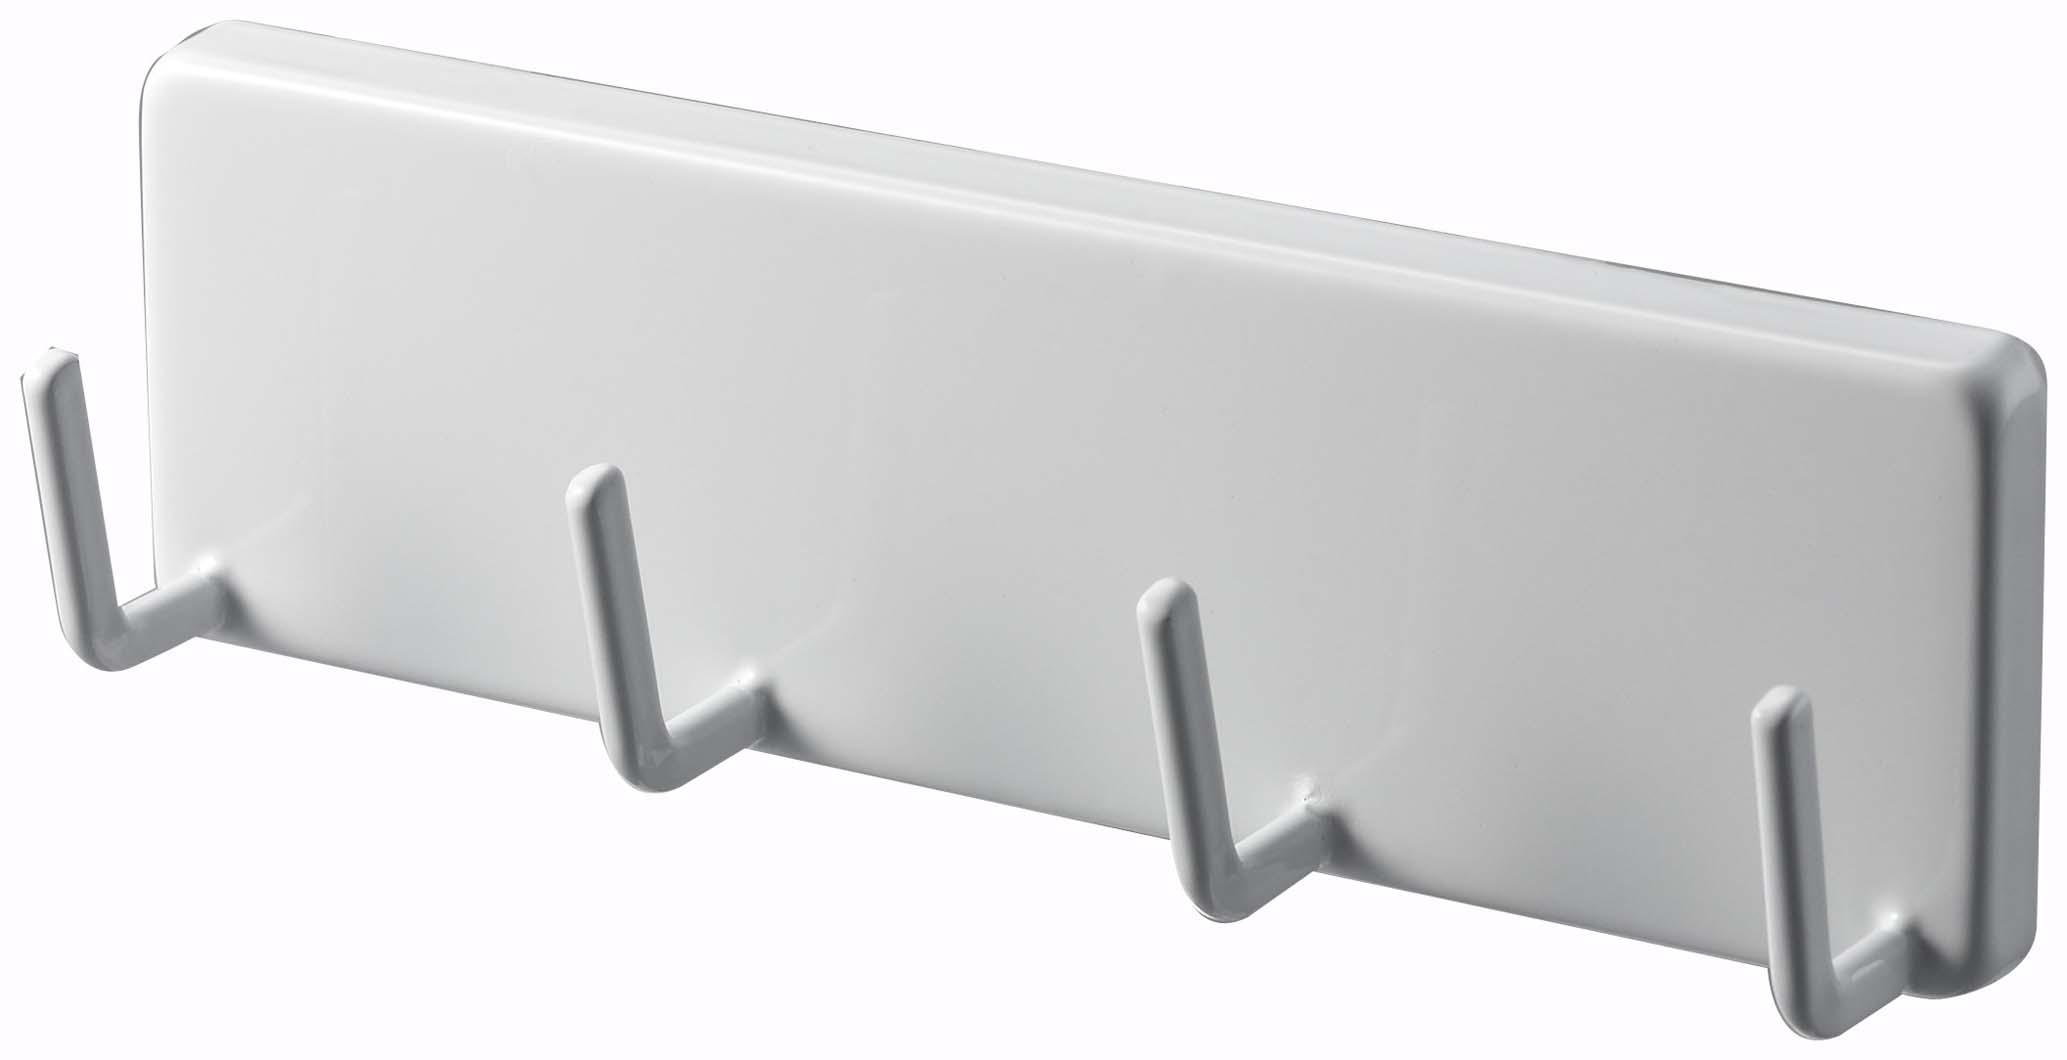 Держатель кухонный Yamazaki TOWER MAGNETIC KITCHEN TOOL HOOK, белый pdr hook tool b3